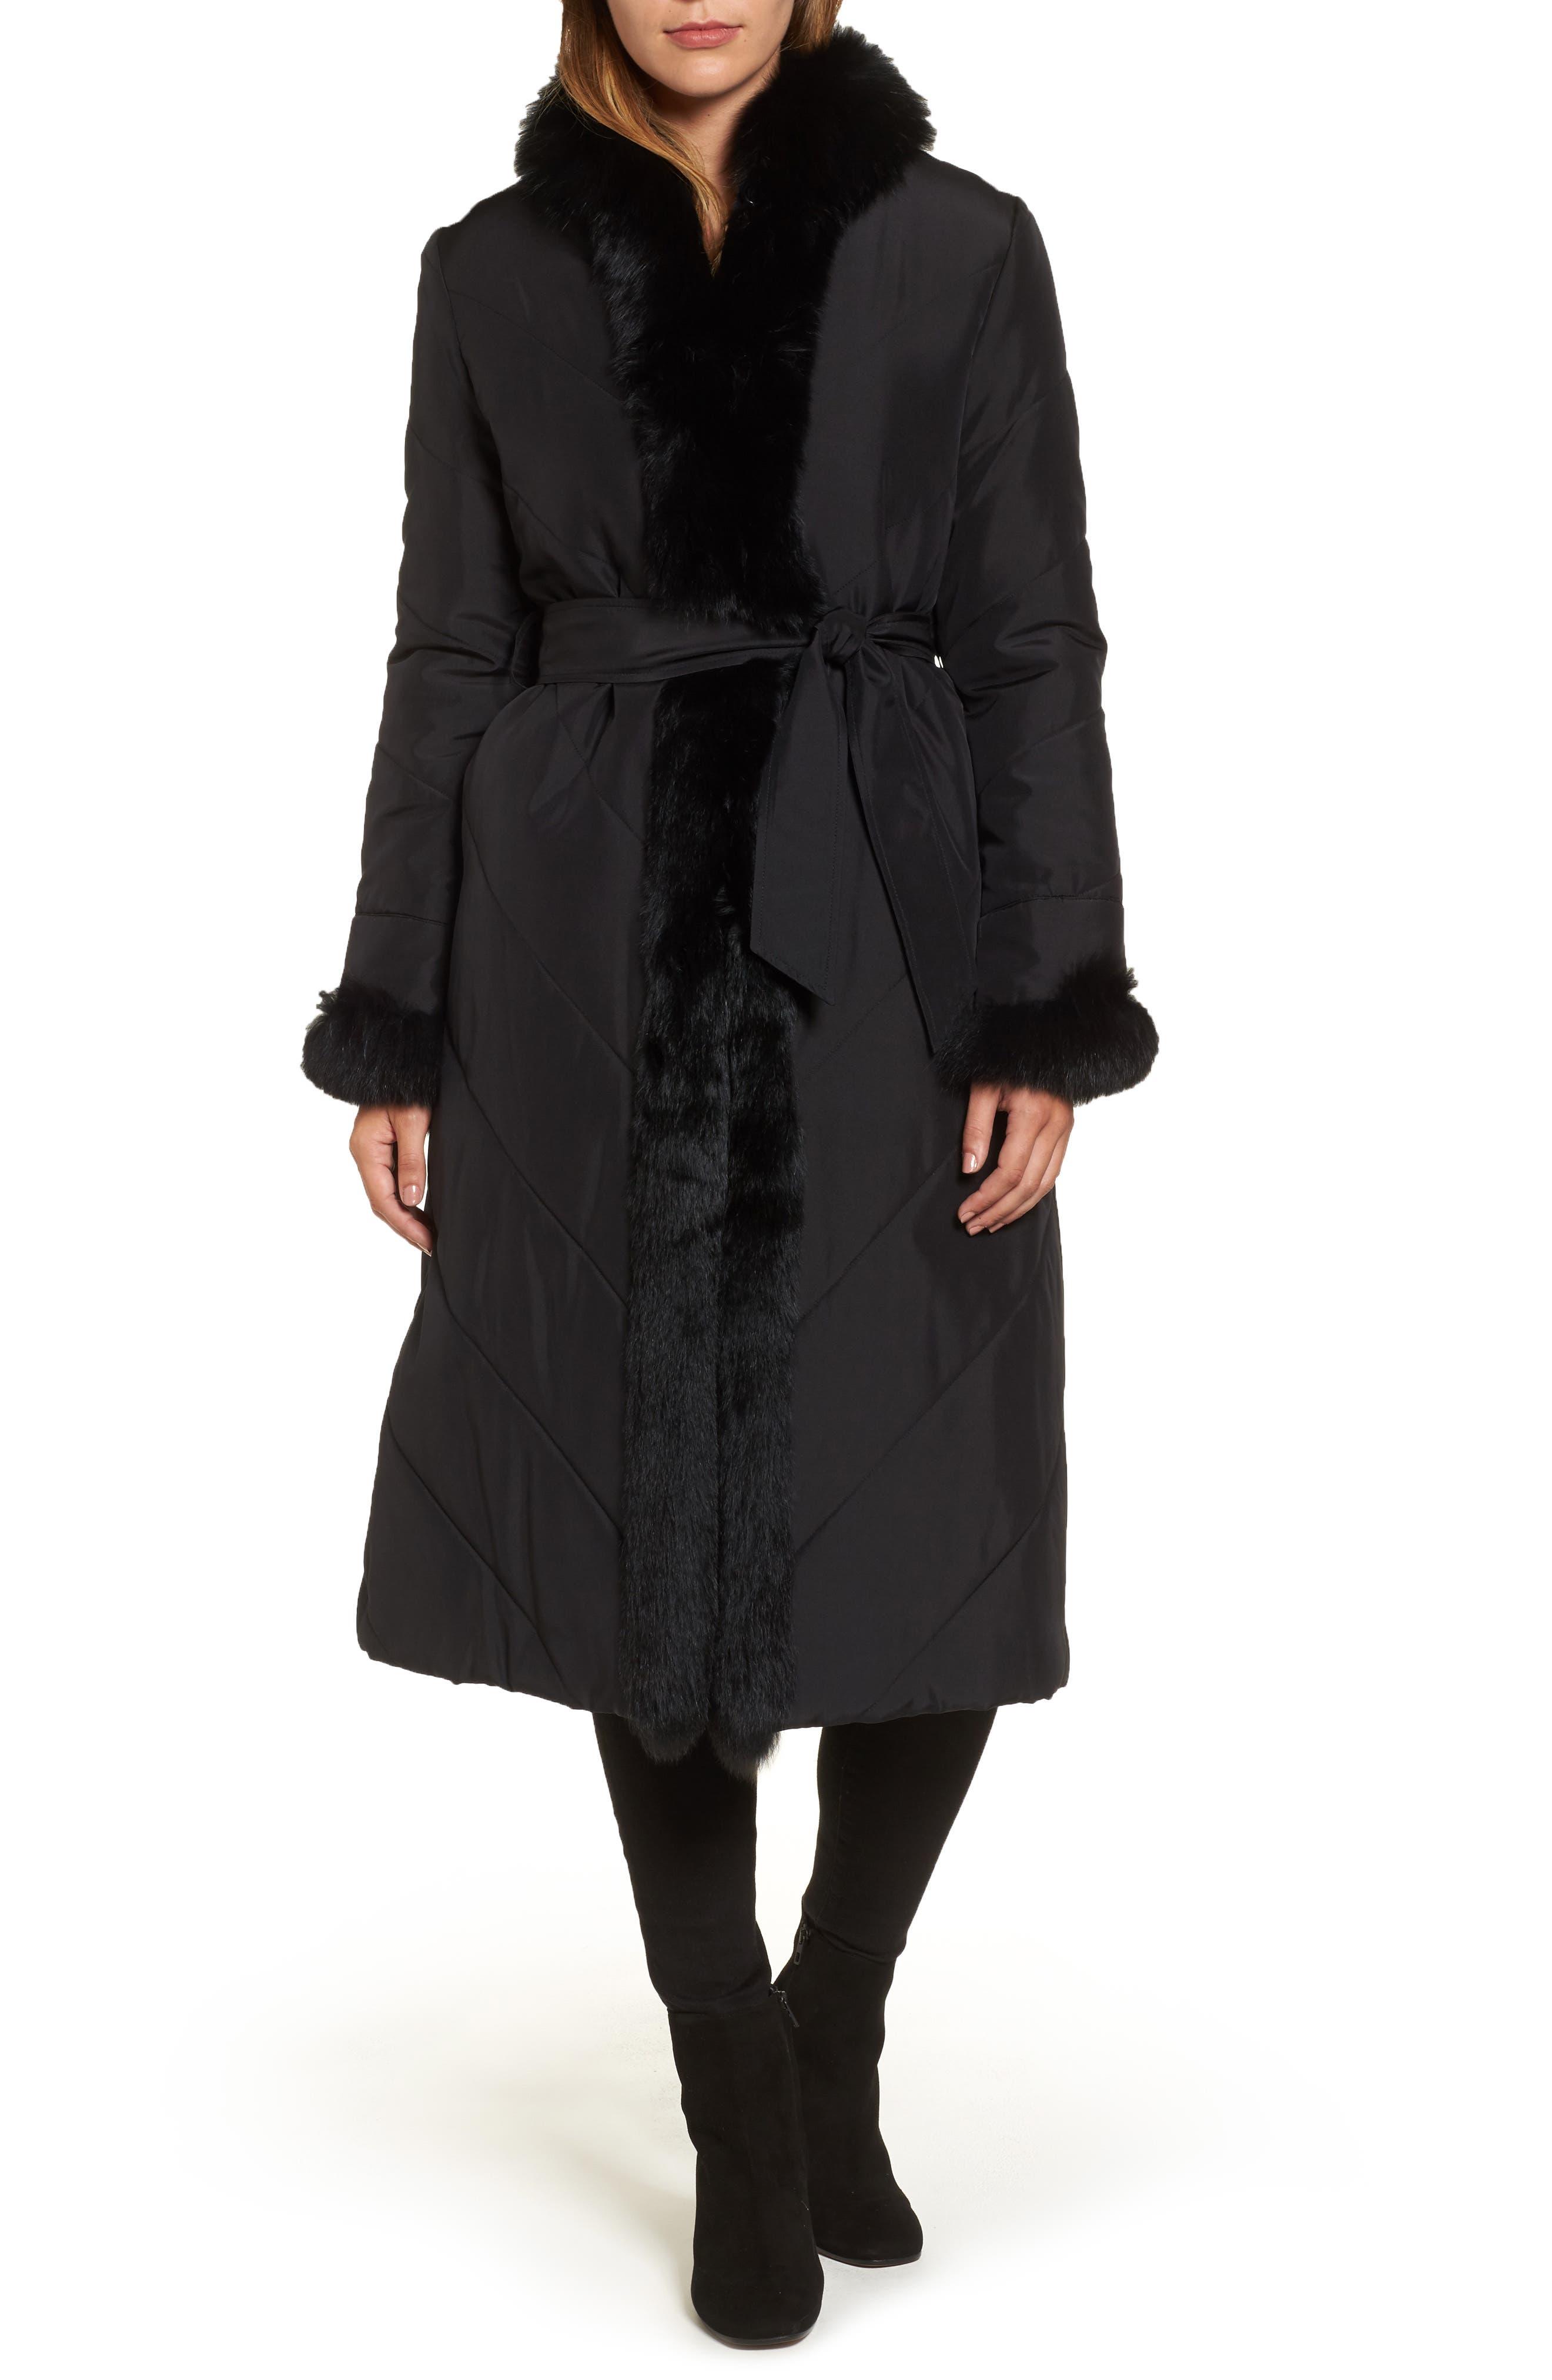 Couture Packable Silk Coat with Genuine Fox Fur & Genuine Rabbit Fur,                         Main,                         color,